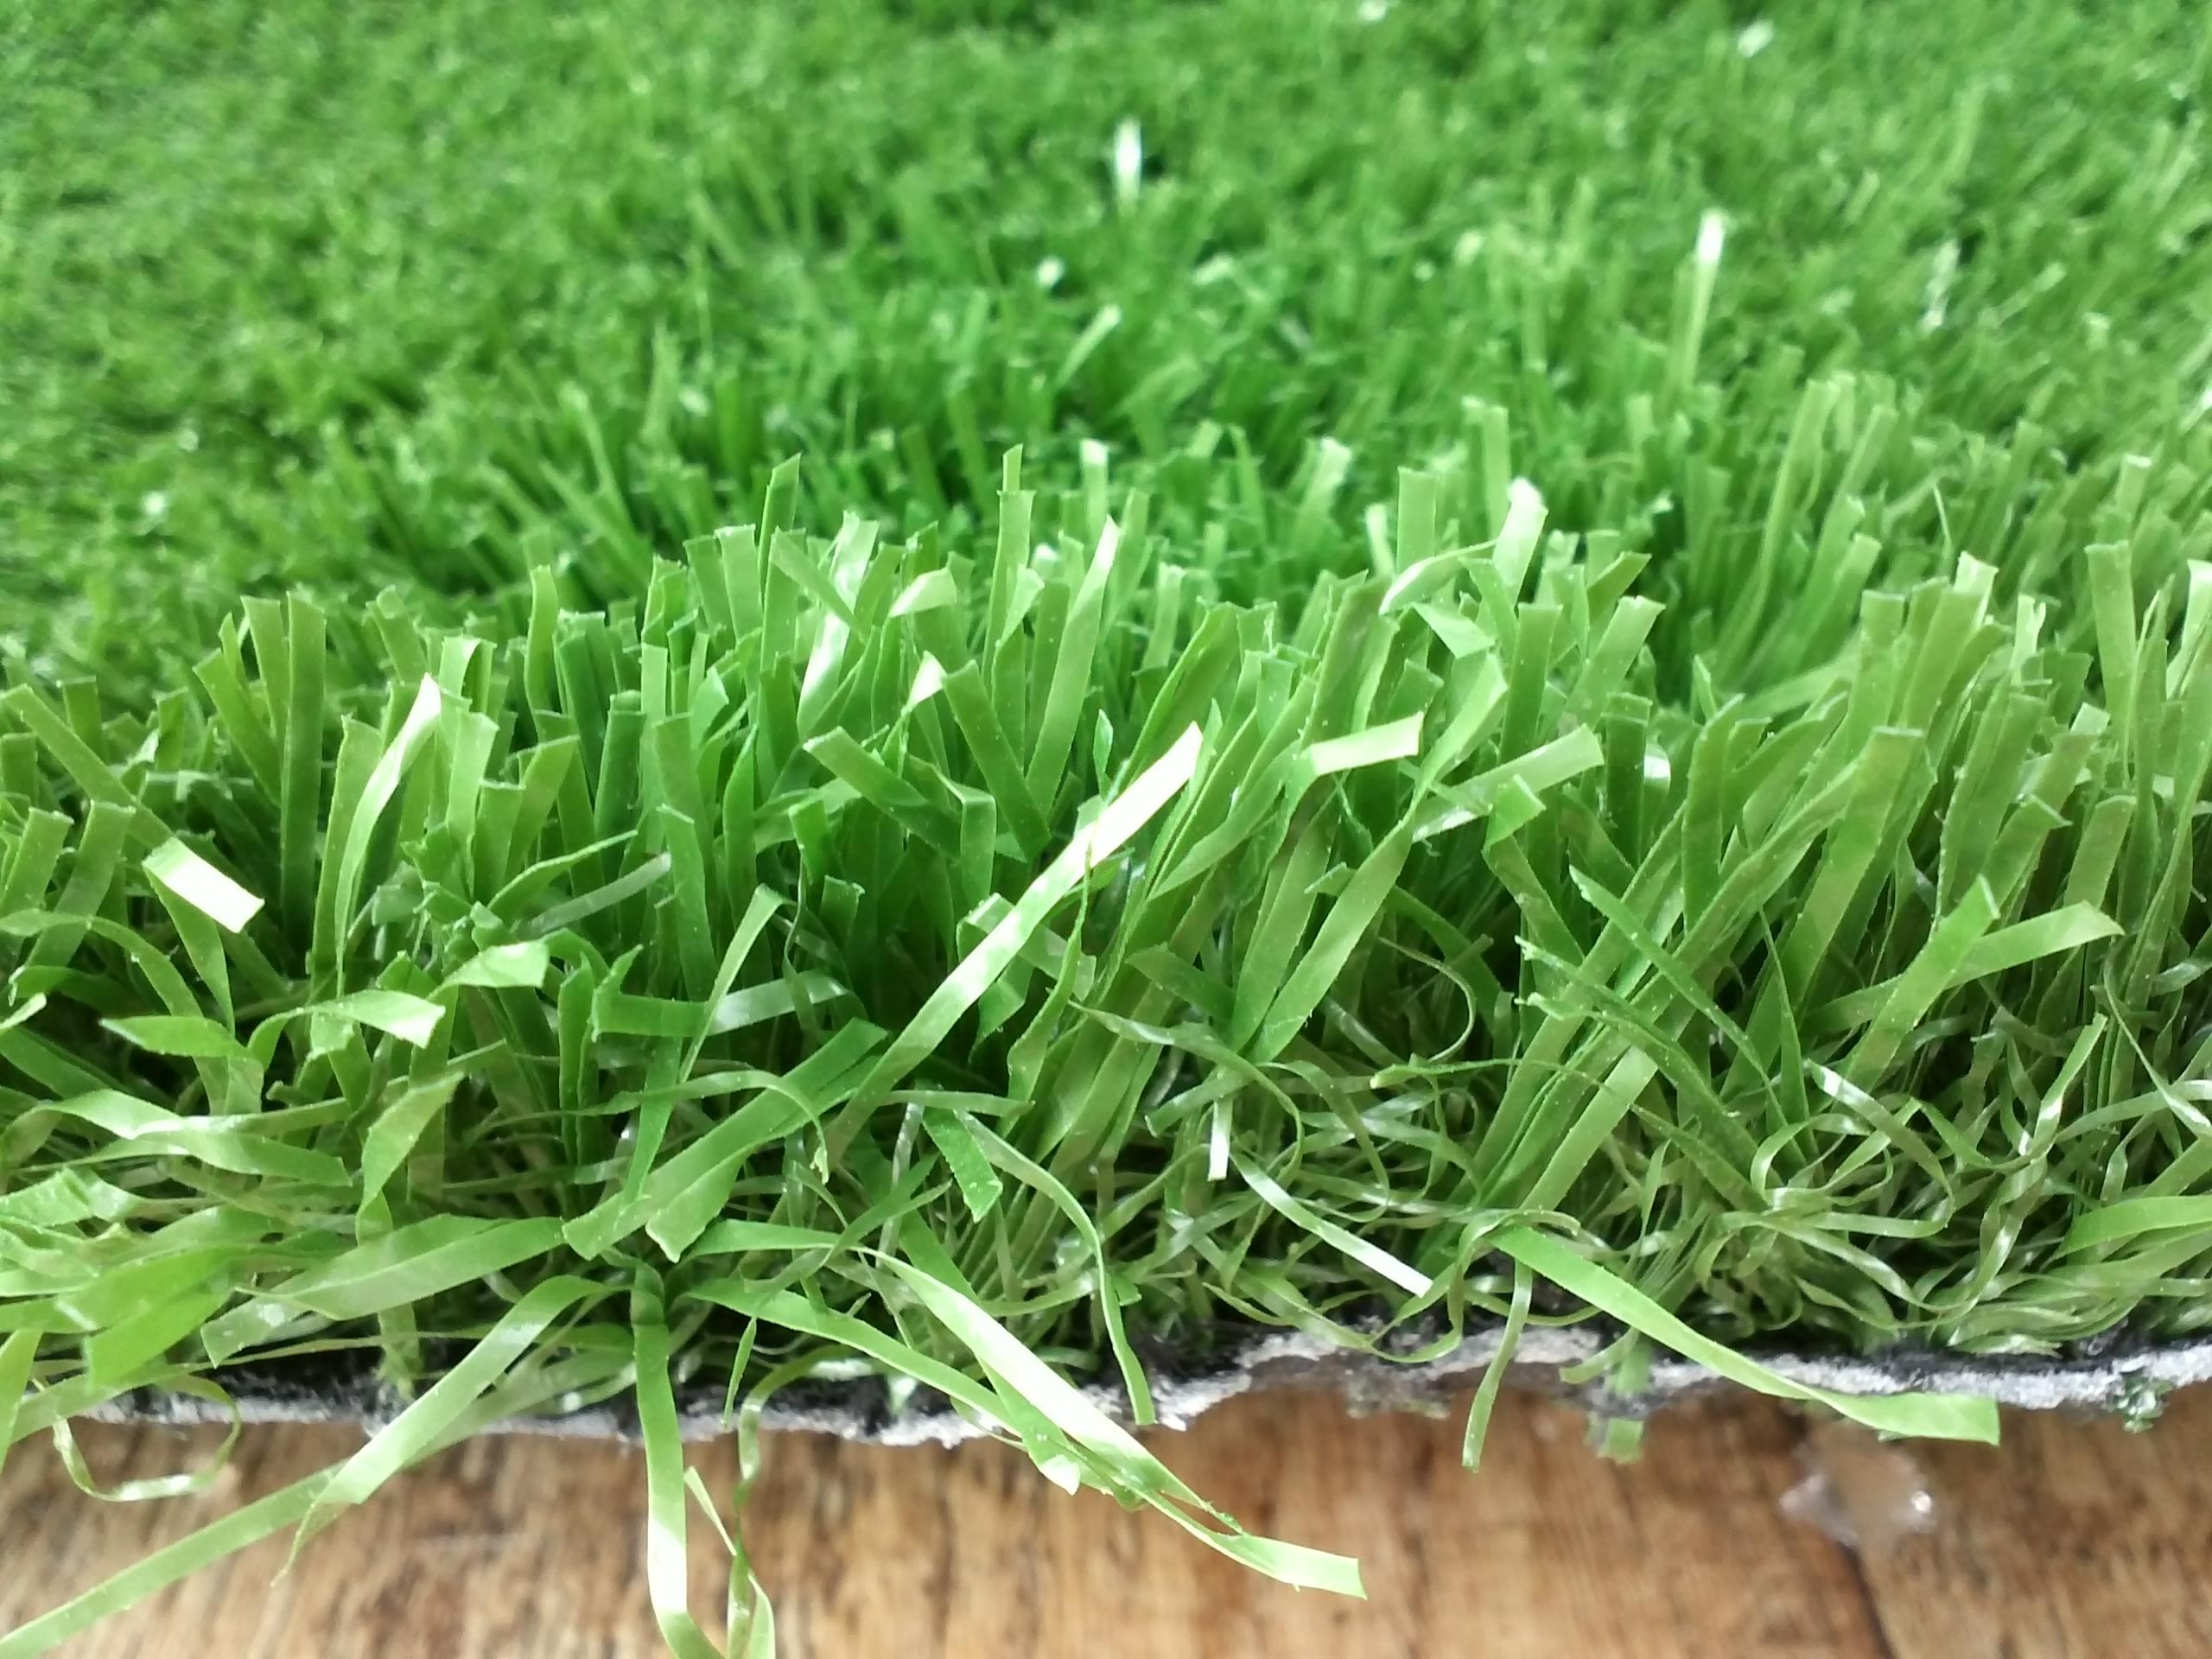 Ландшафтная искусственная трава LandScape 40мм.